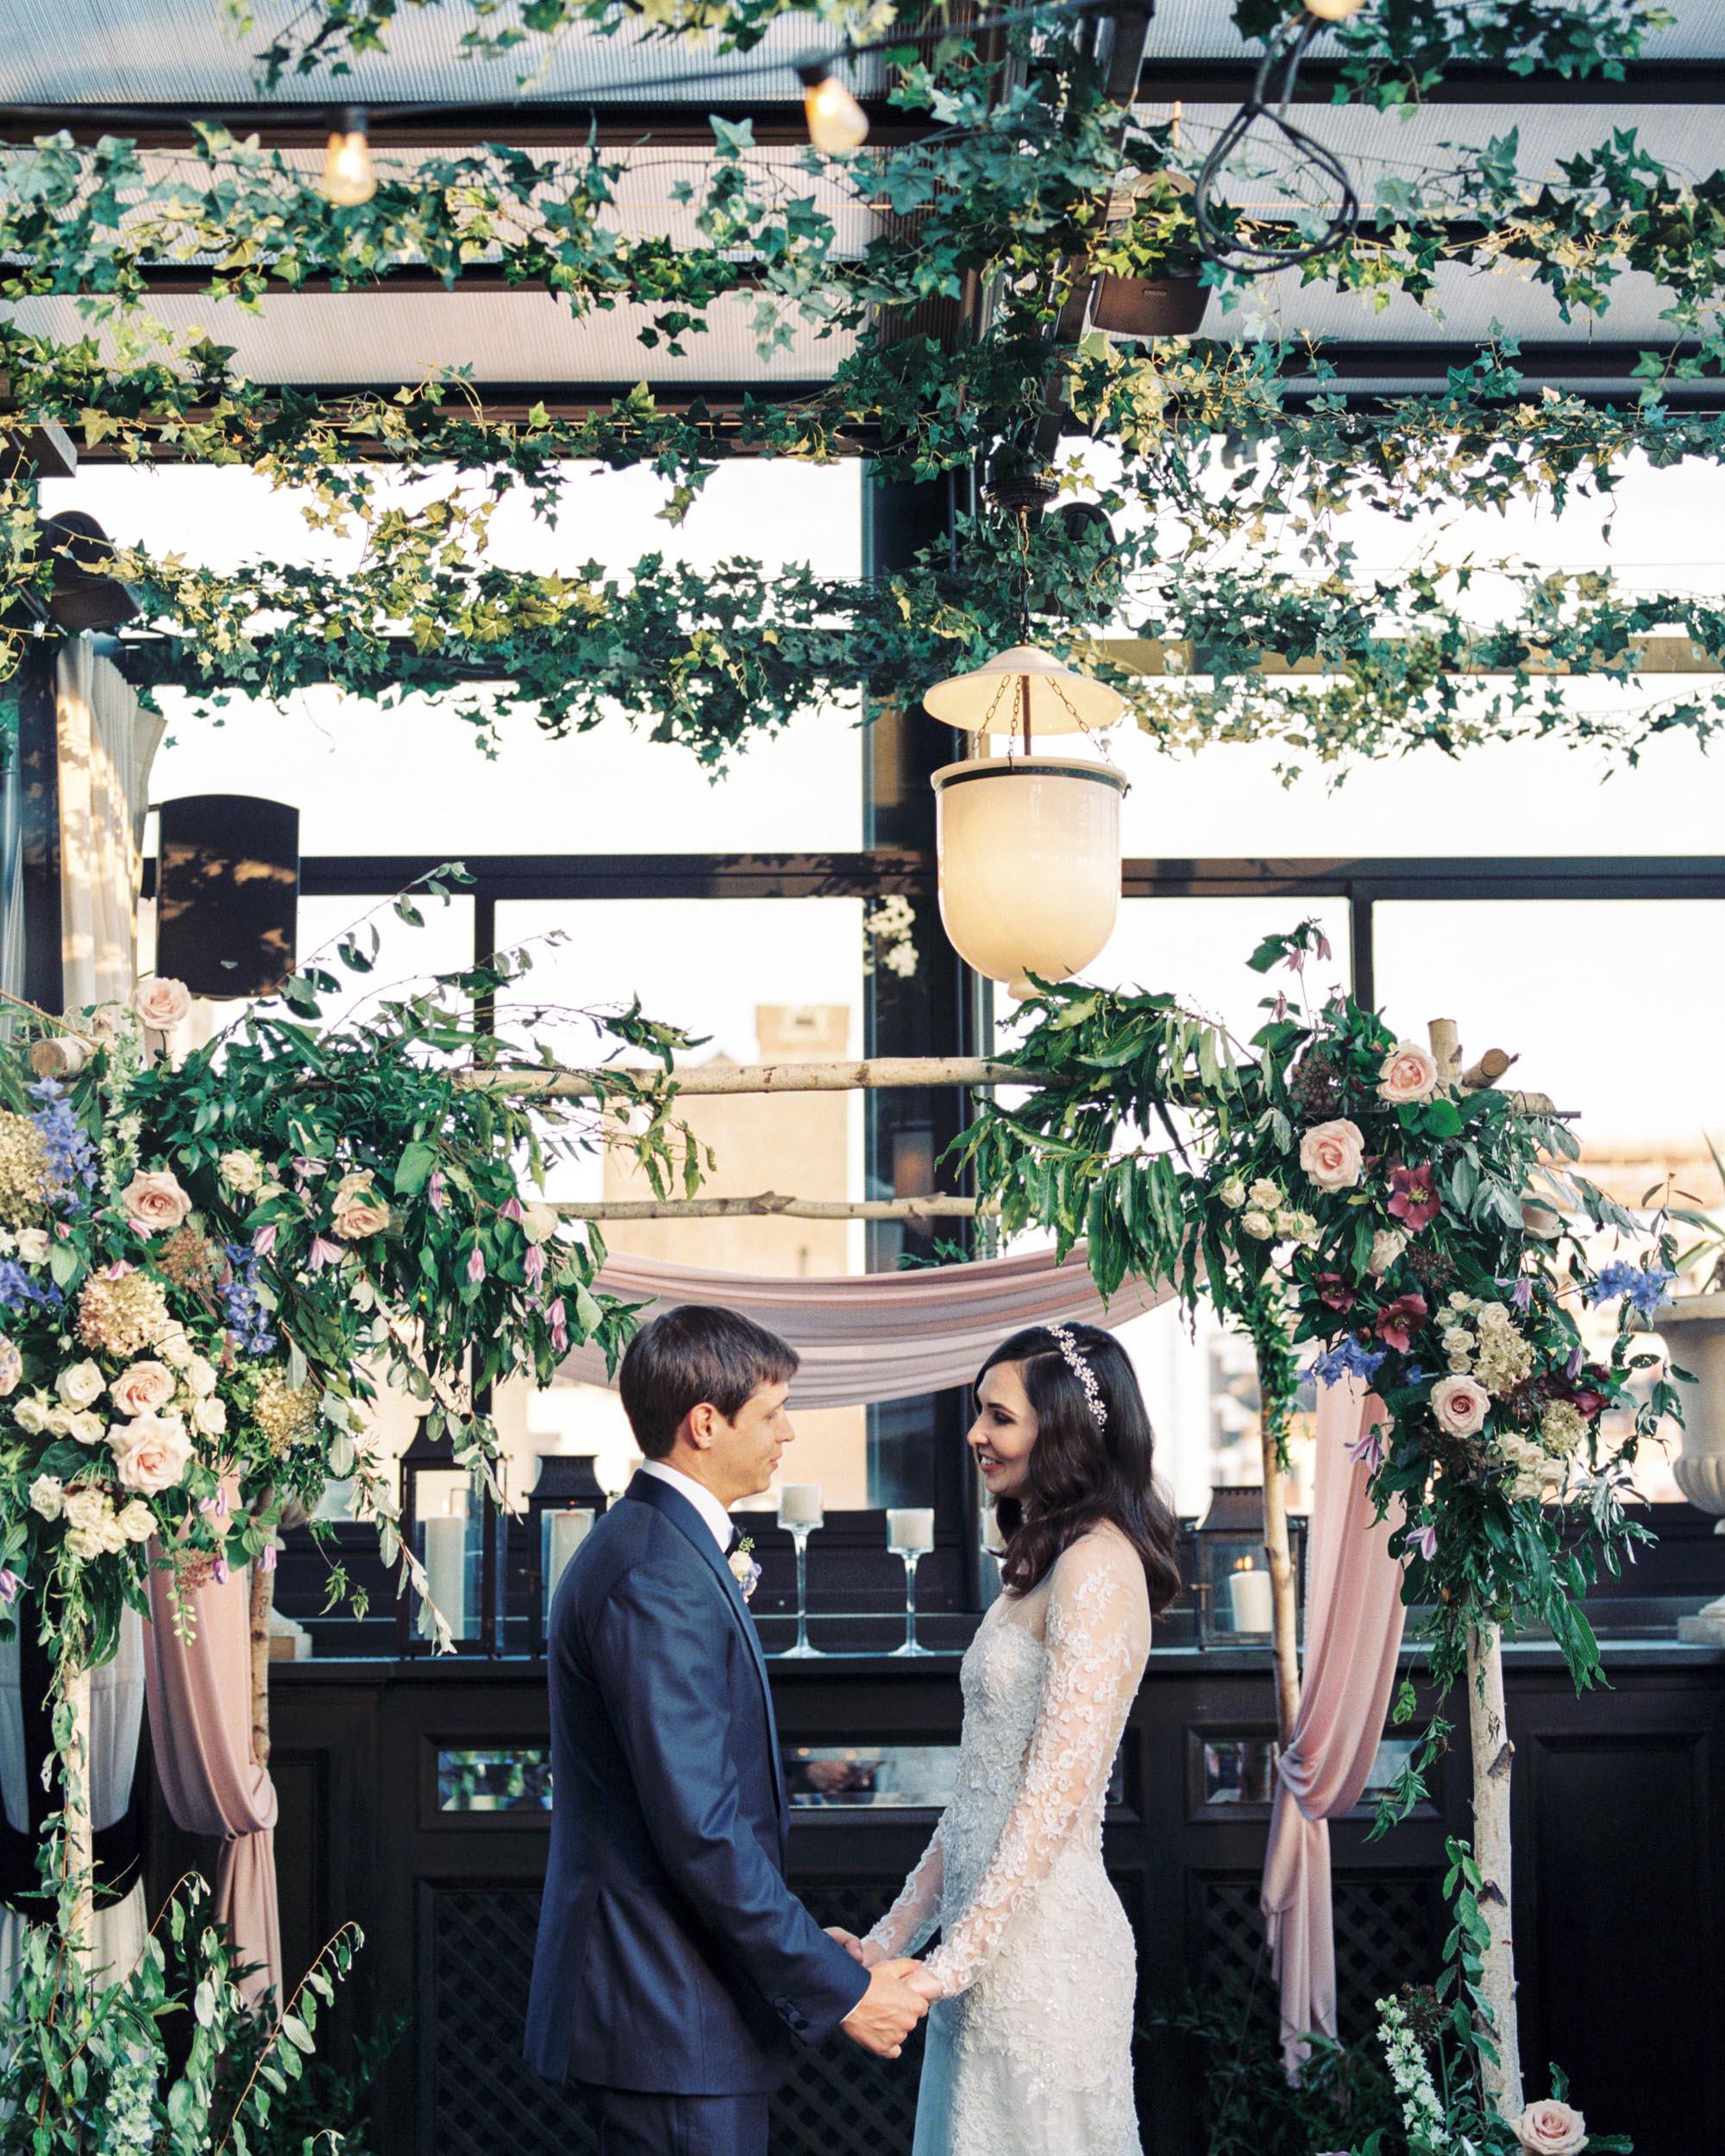 Gramercy Park Hotel Wedding Photographer 22 - Gramercy Park Hotel